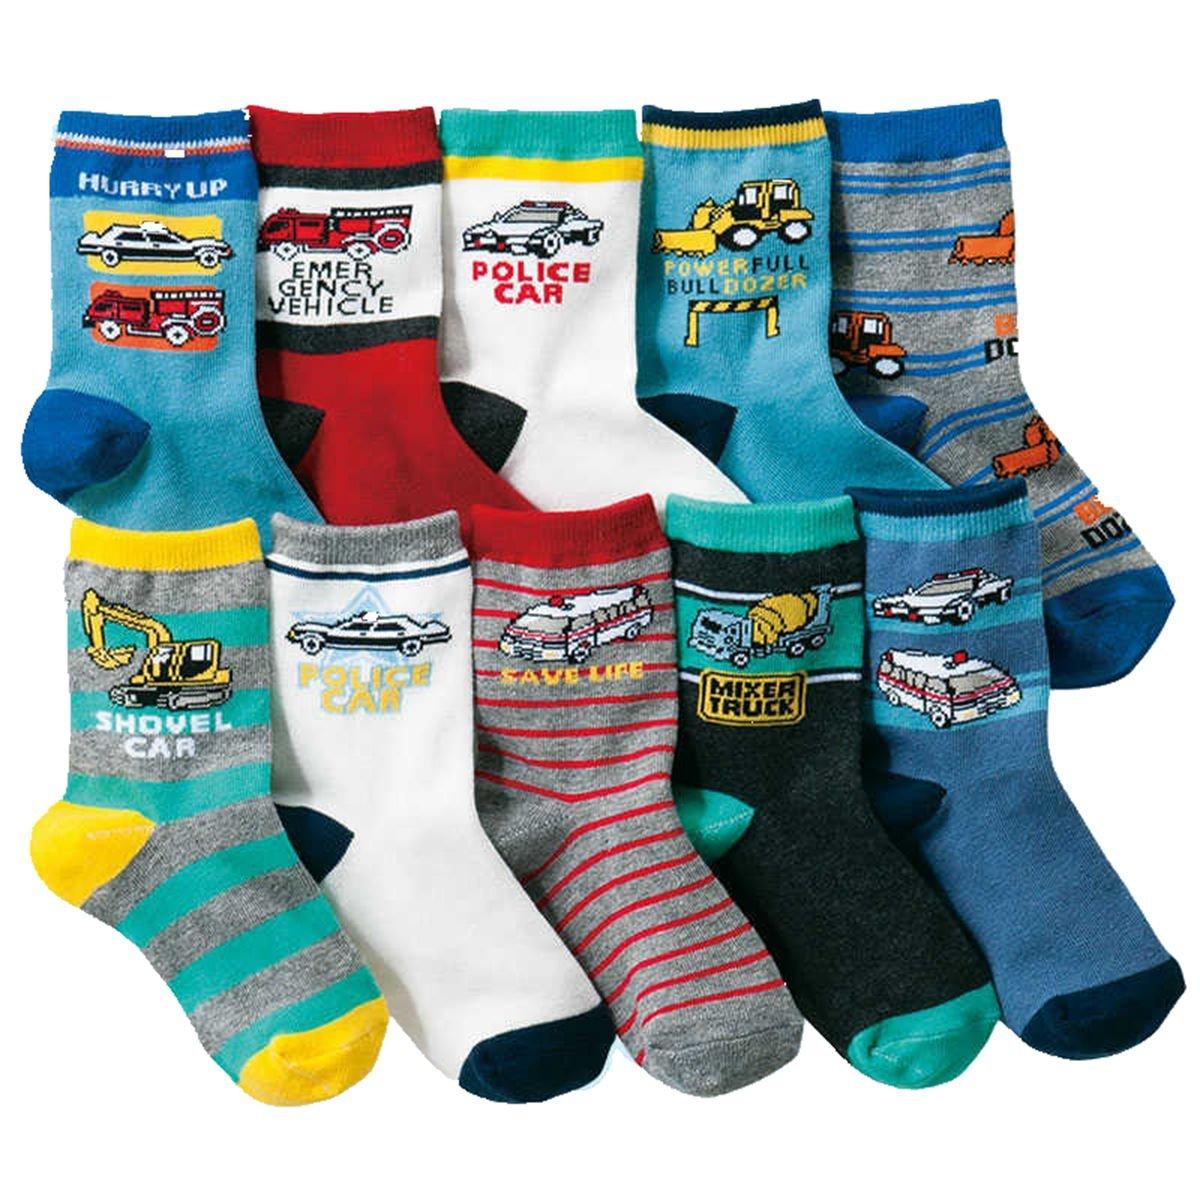 Boys Short Socks Fashion Excavator Cotton Basic Crew Kids Socks 10 Pair Pack